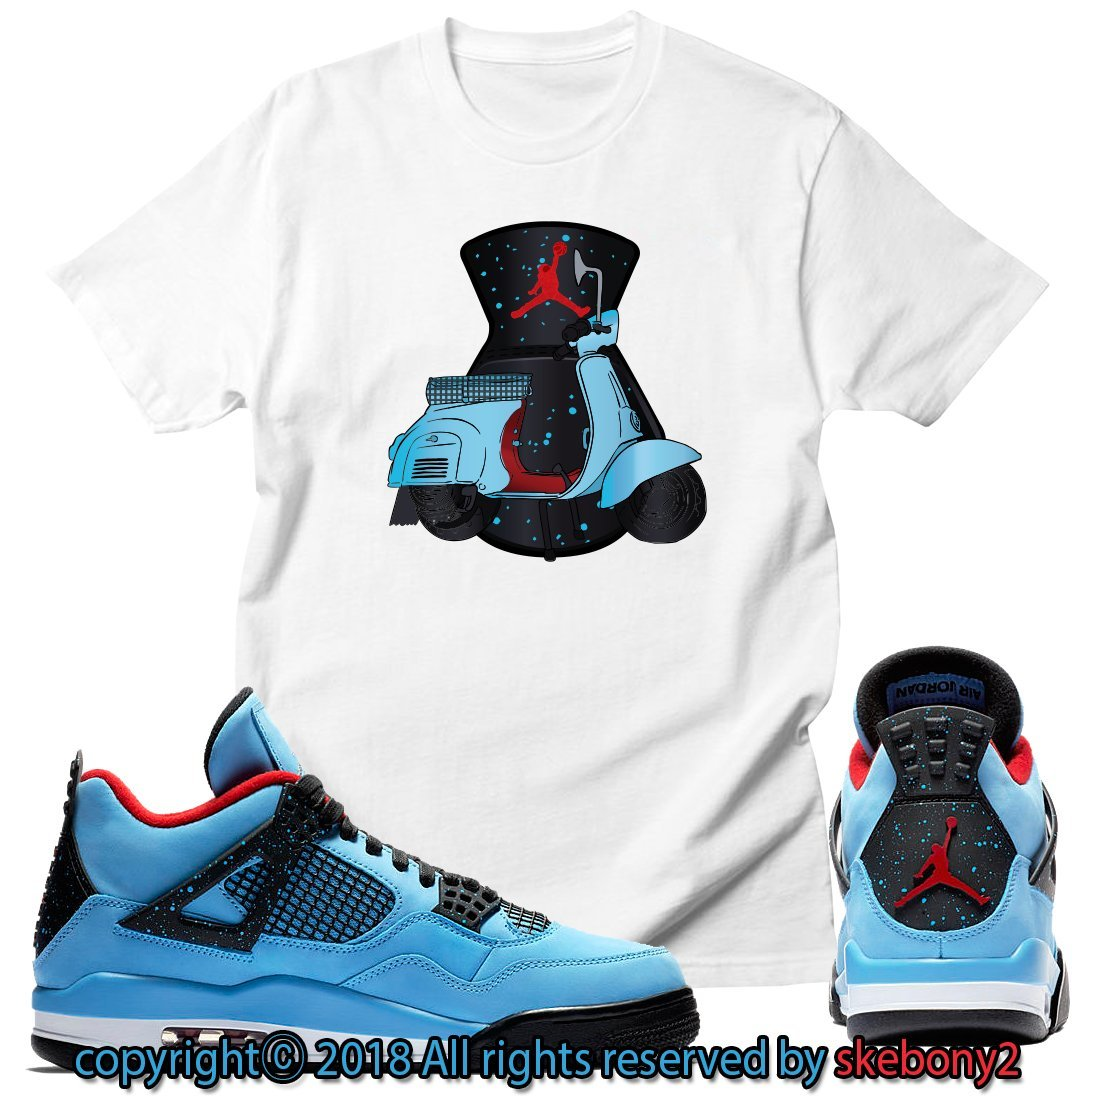 493976267c6 Custom T Shirt Matching Travis Scott x Air Jordan 4 Cactus Jack JD 4 ...